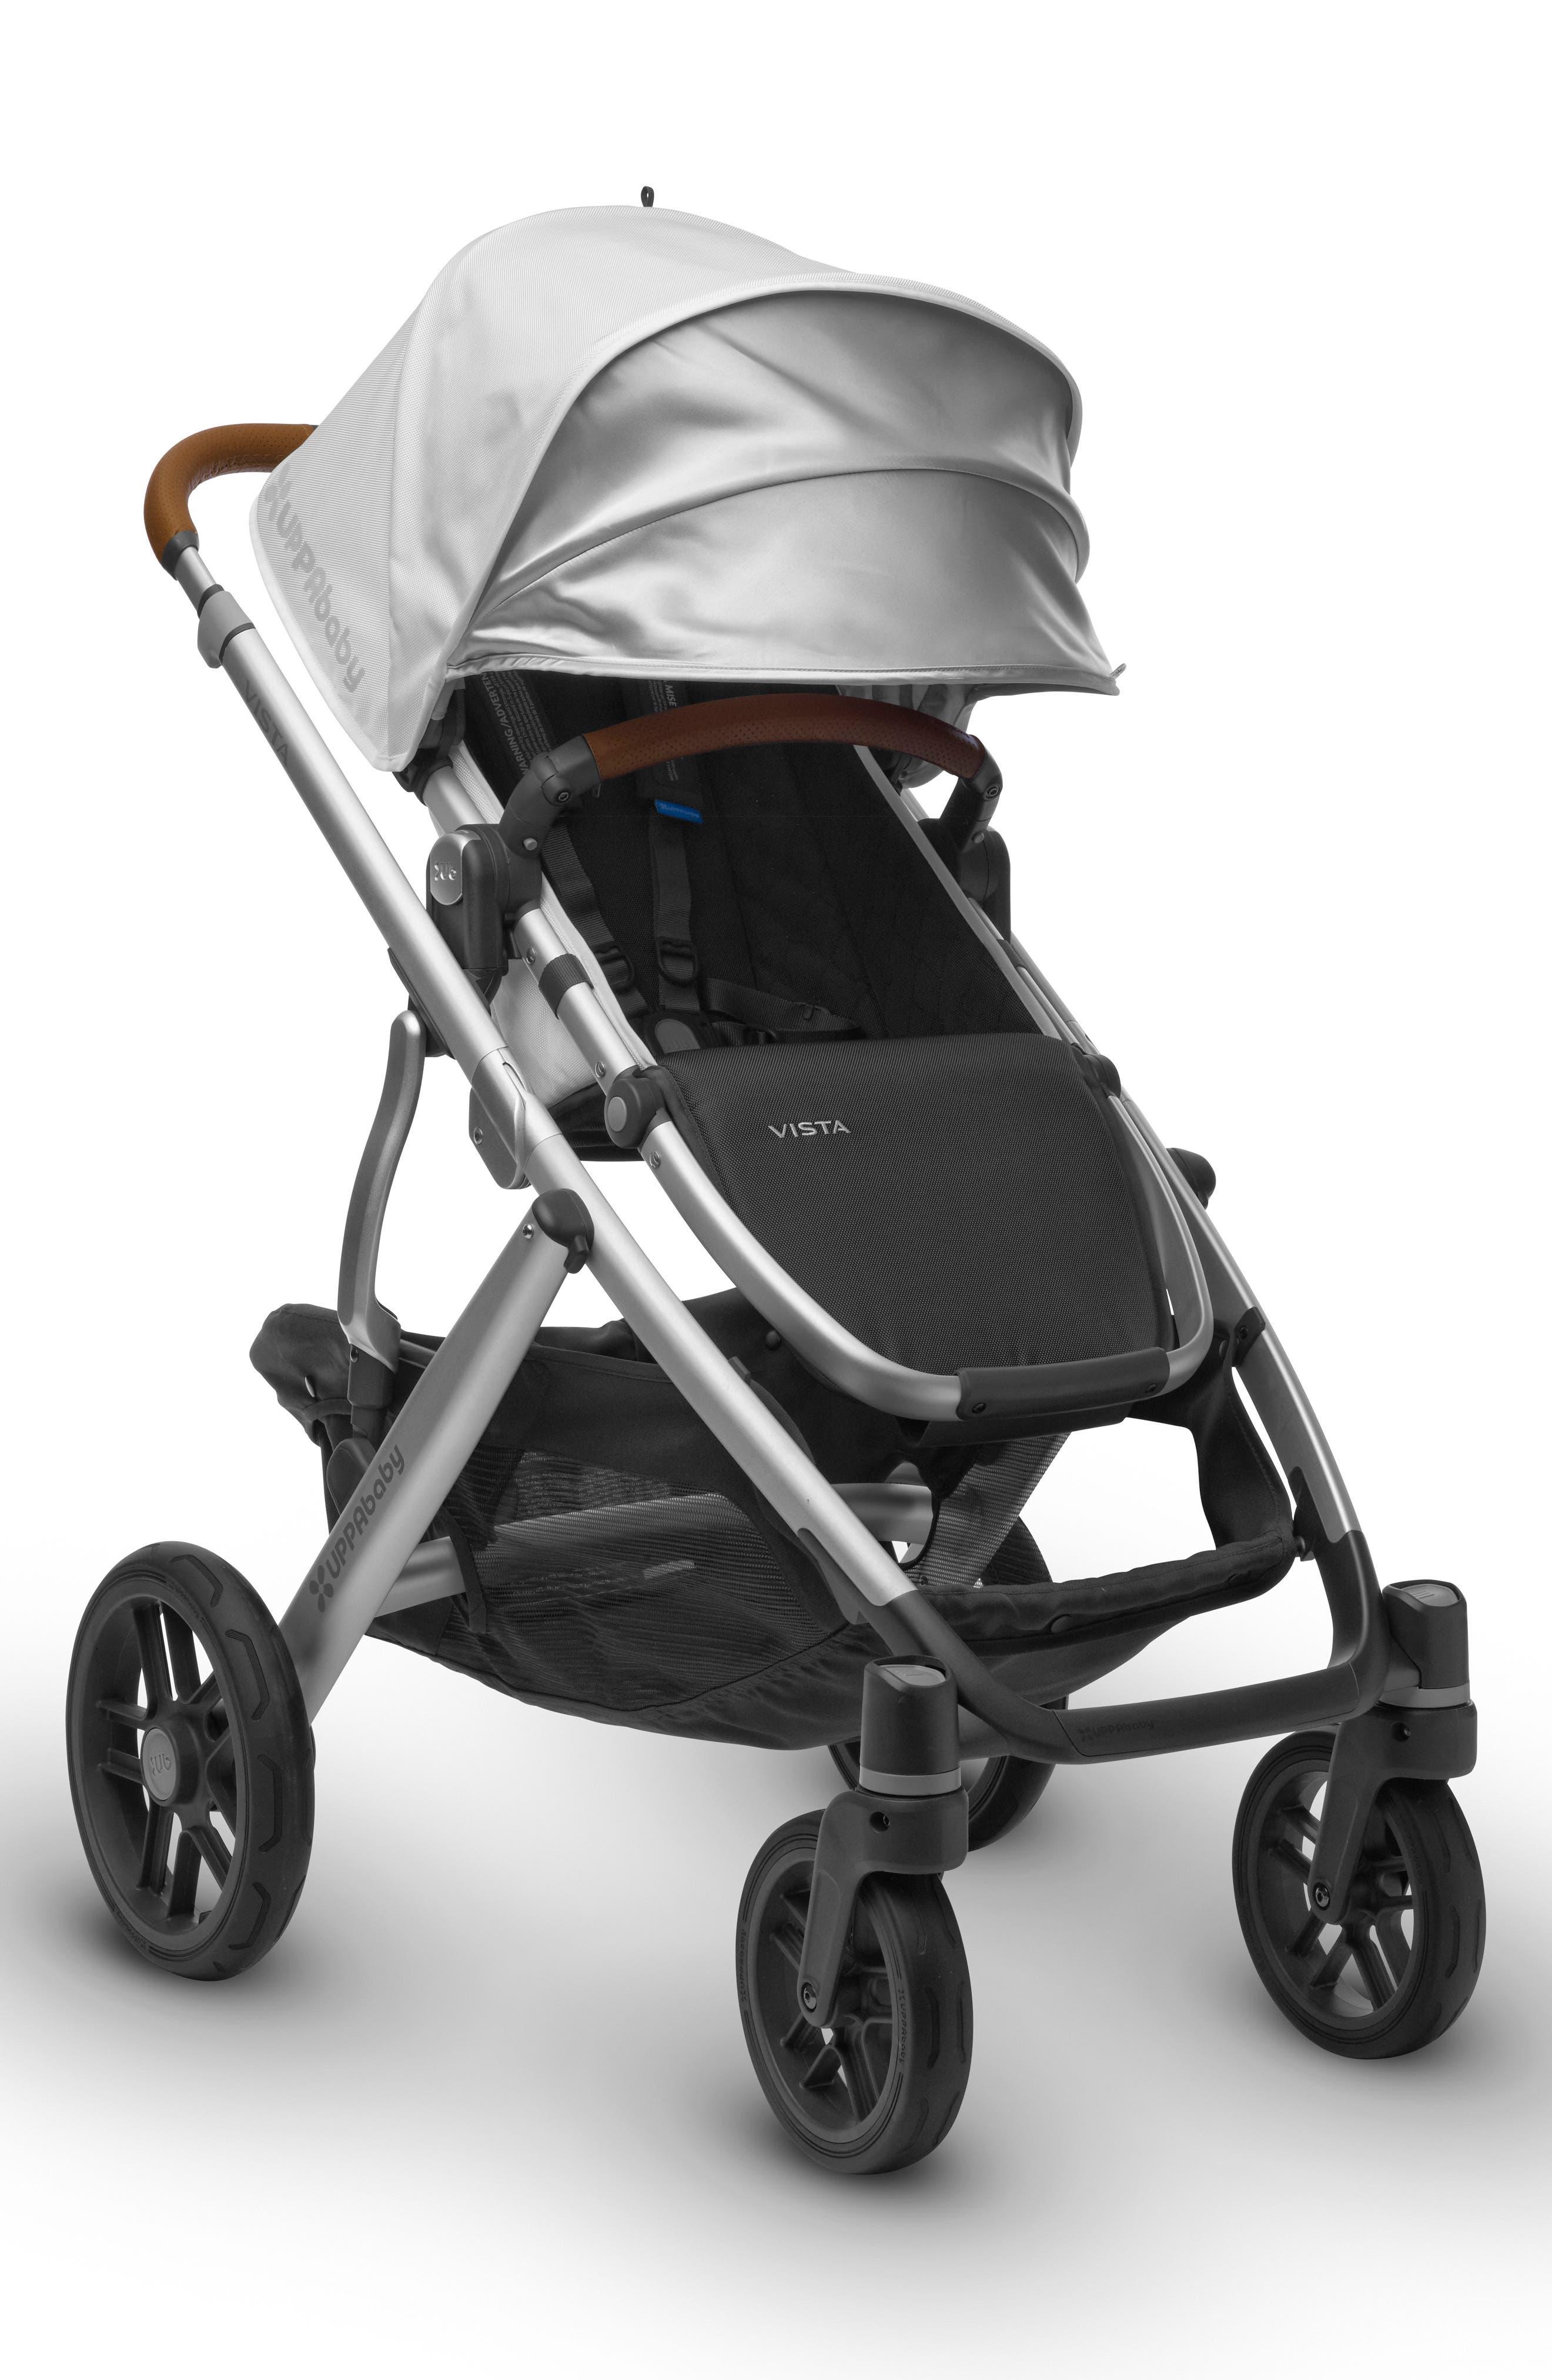 2017 VISTA Aluminum Frame Convertible Stroller with Bassinet & Toddler Seat,                             Alternate thumbnail 2, color,                             White/ Silver